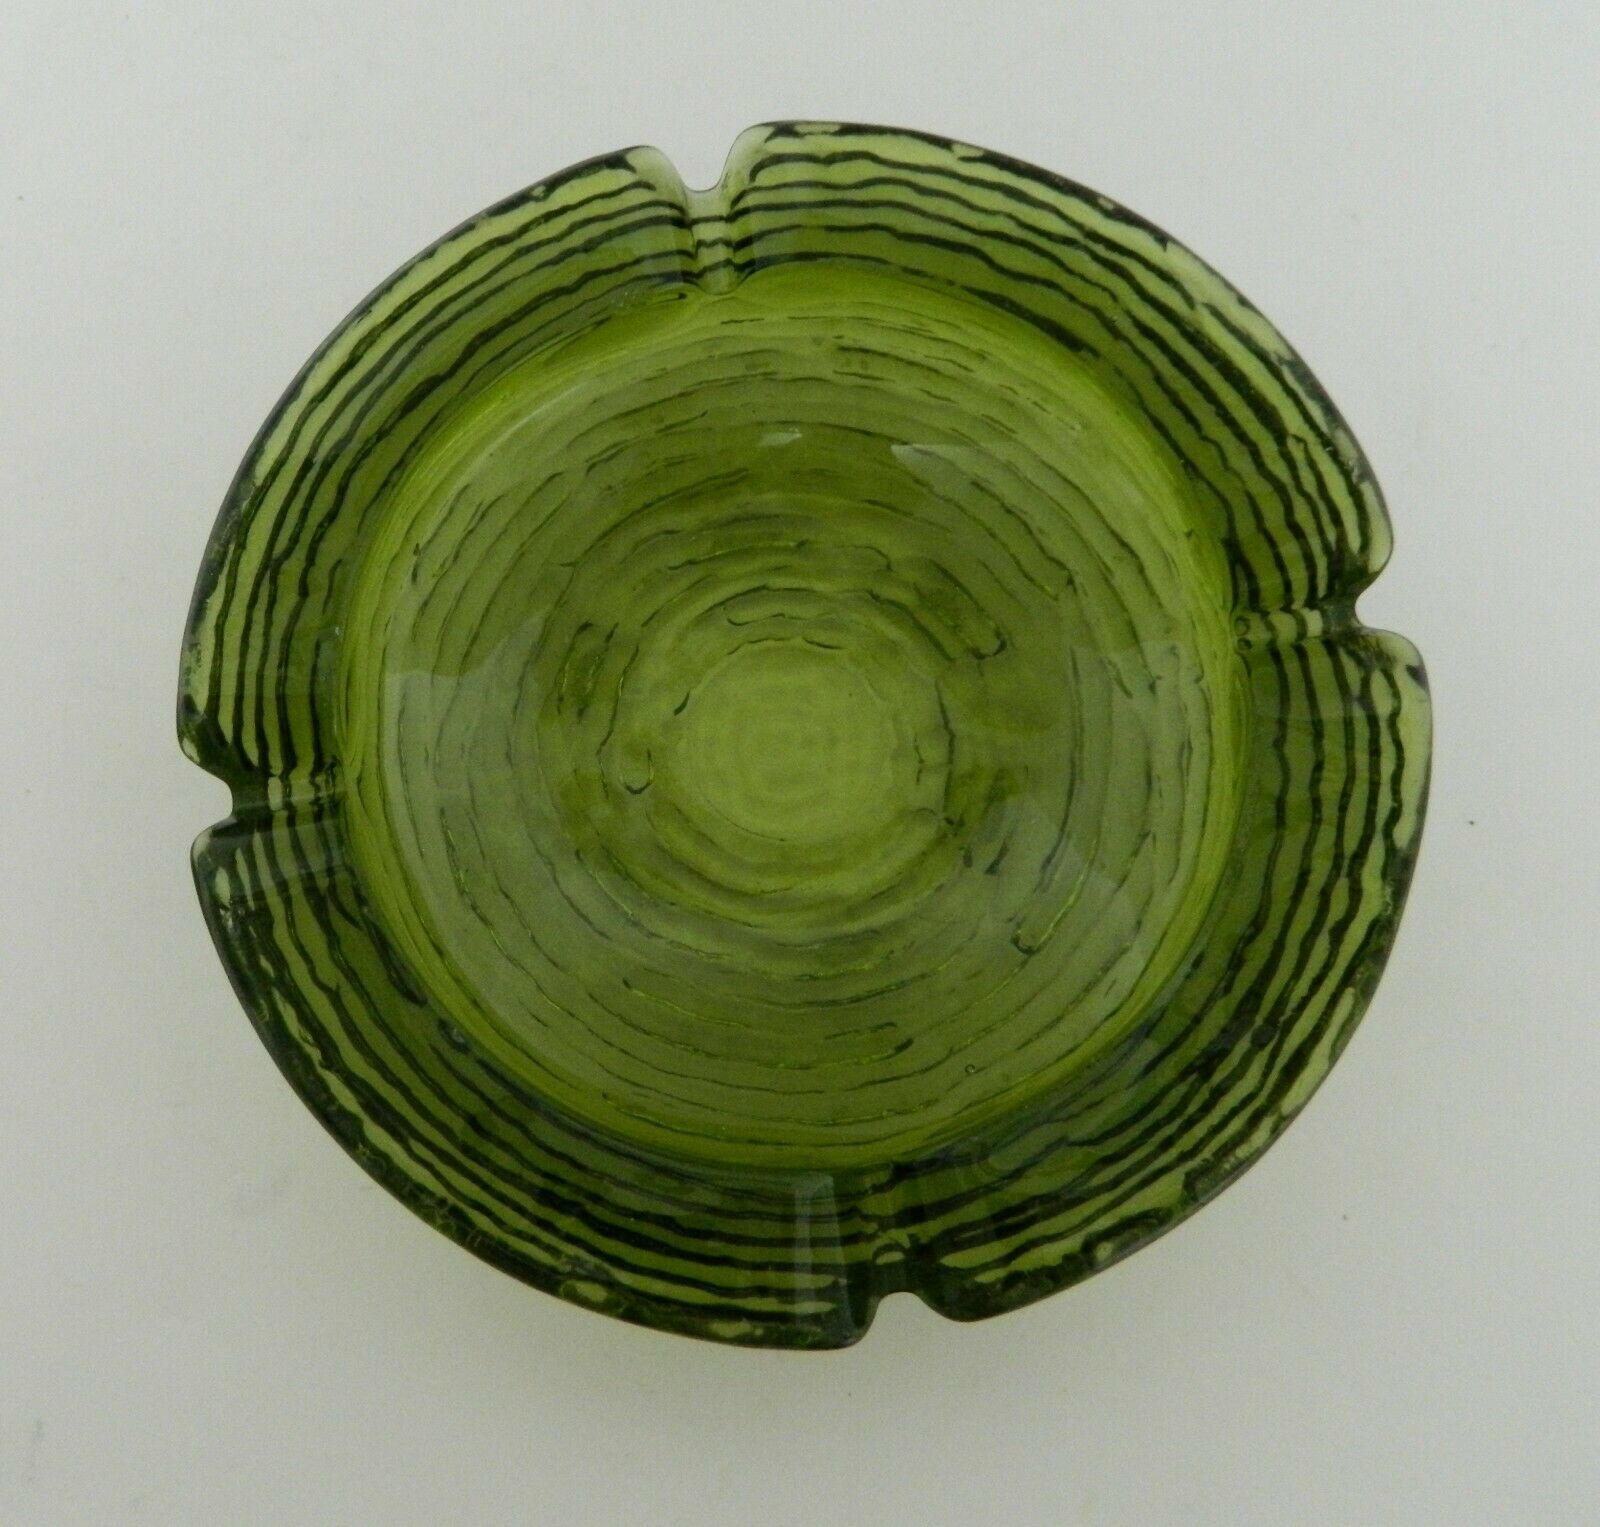 Soreno Anchor Hocking Medium Ashtray Four Rests Concentric Circles Avocado